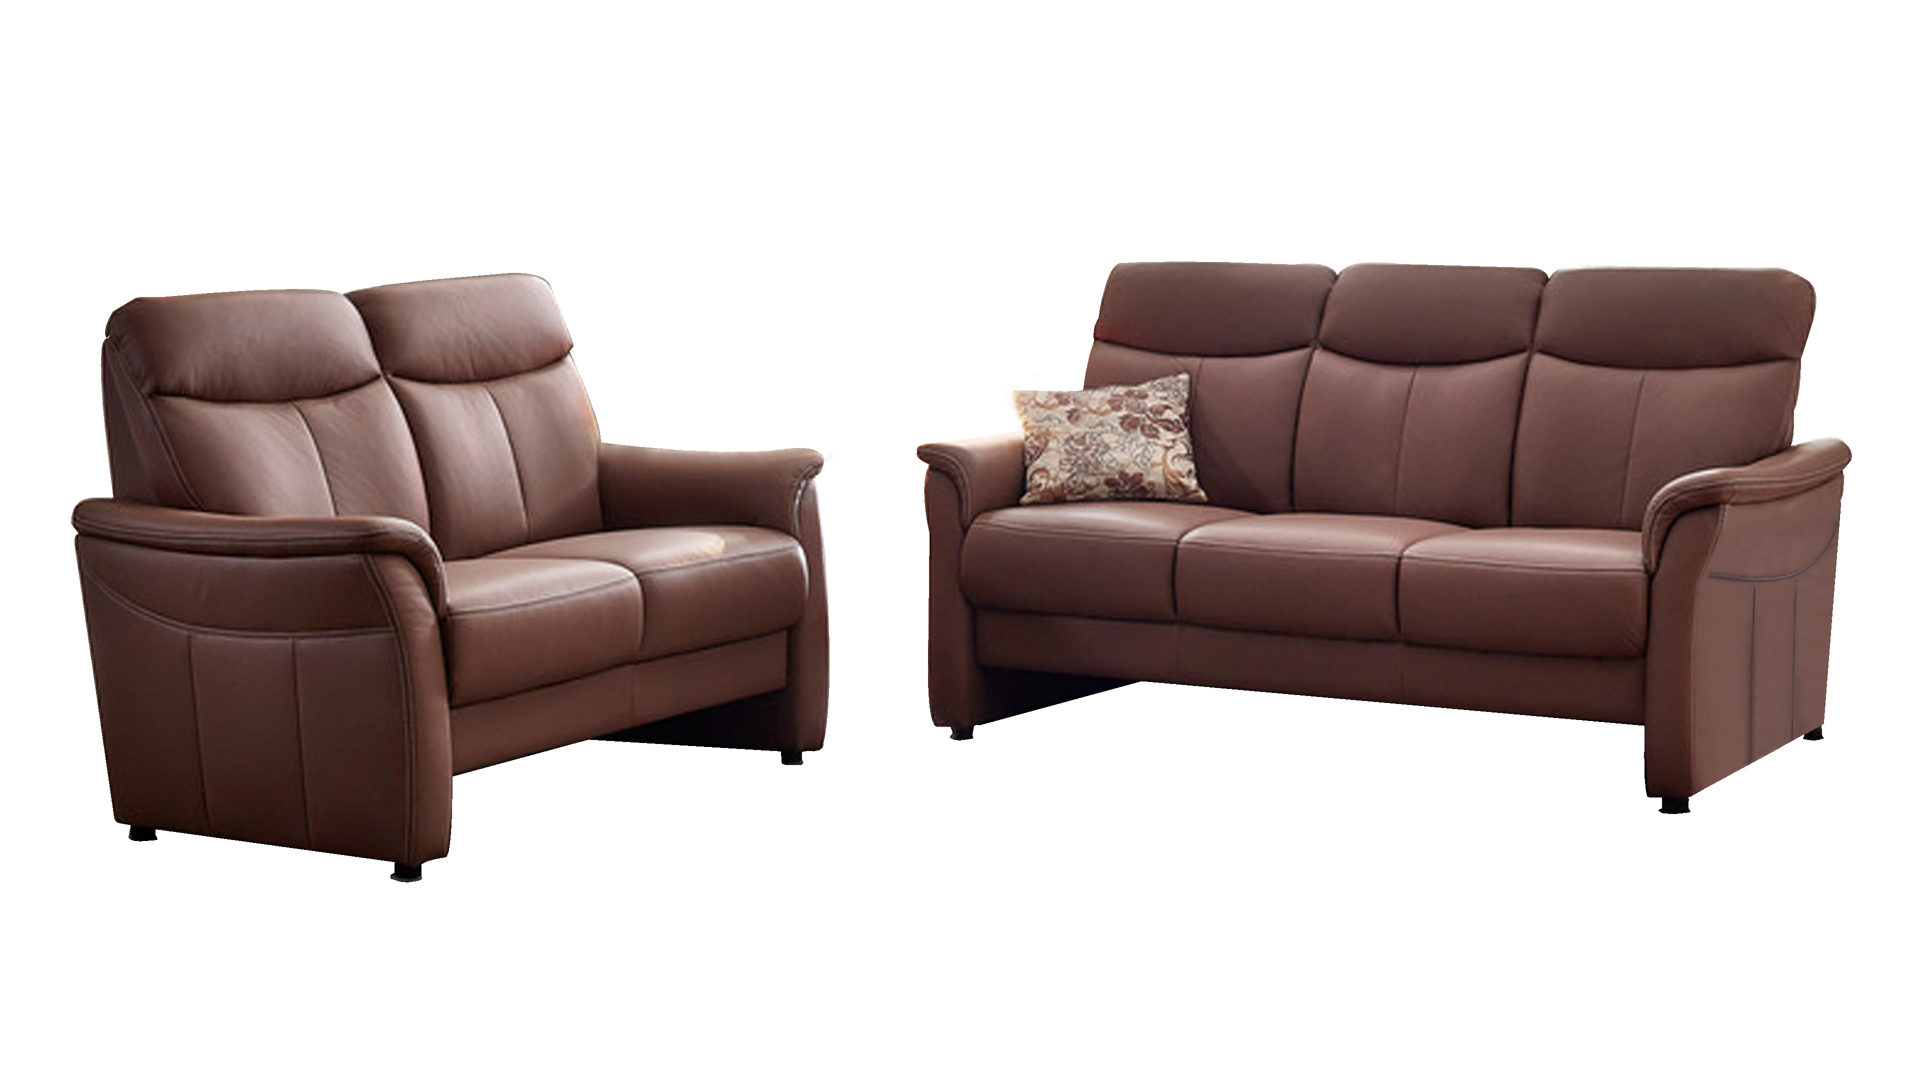 3 sitzer sofa mit federkern, orthosedis 3-sitzer und 2-sitzer, sofas mit federkern, Design ideen